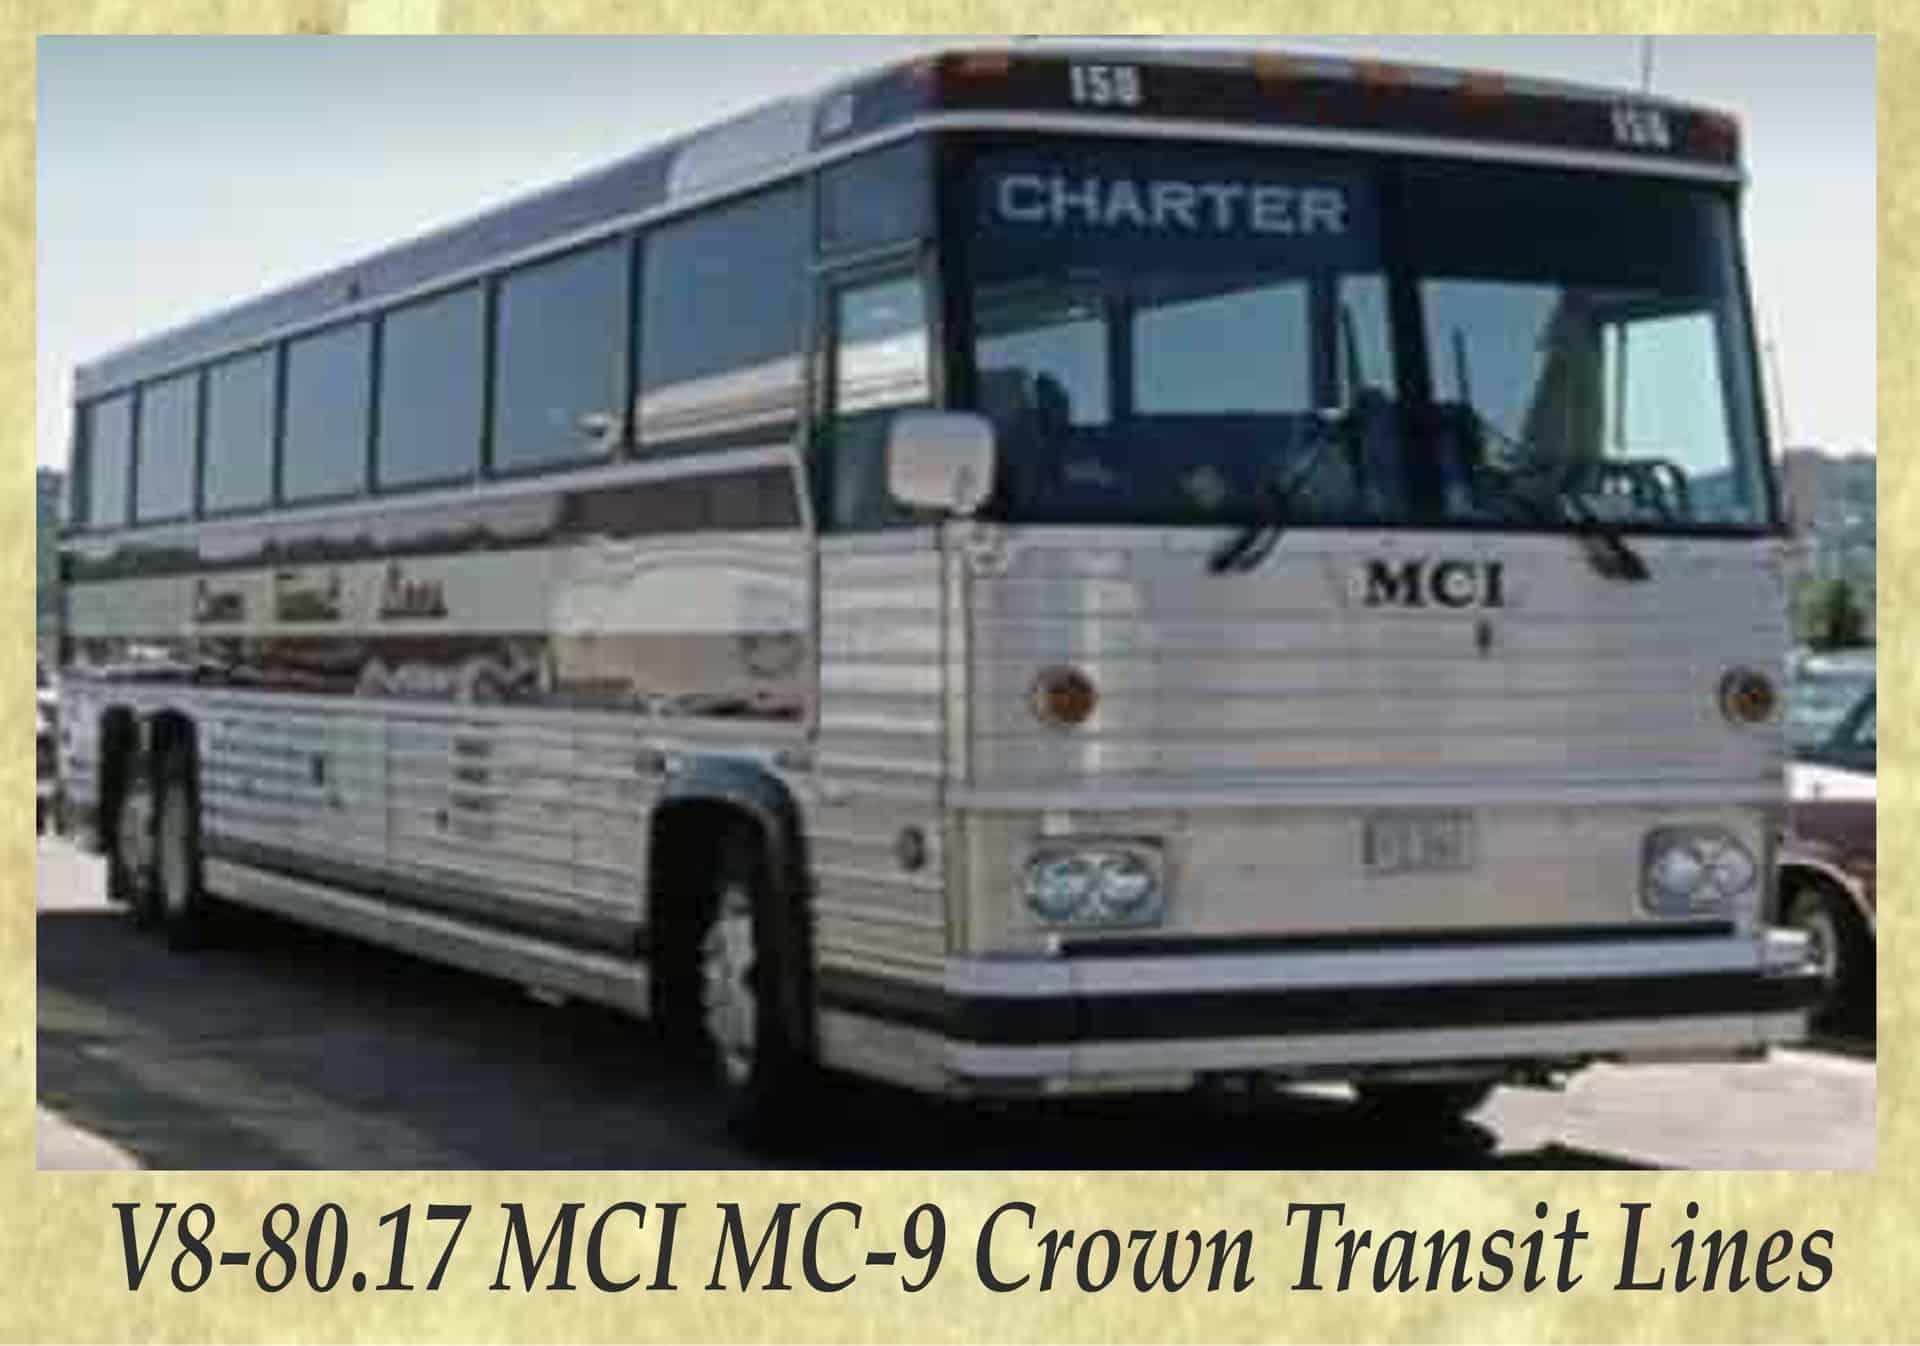 V8-80.17 MCI MC-9 Crown Transit Lines